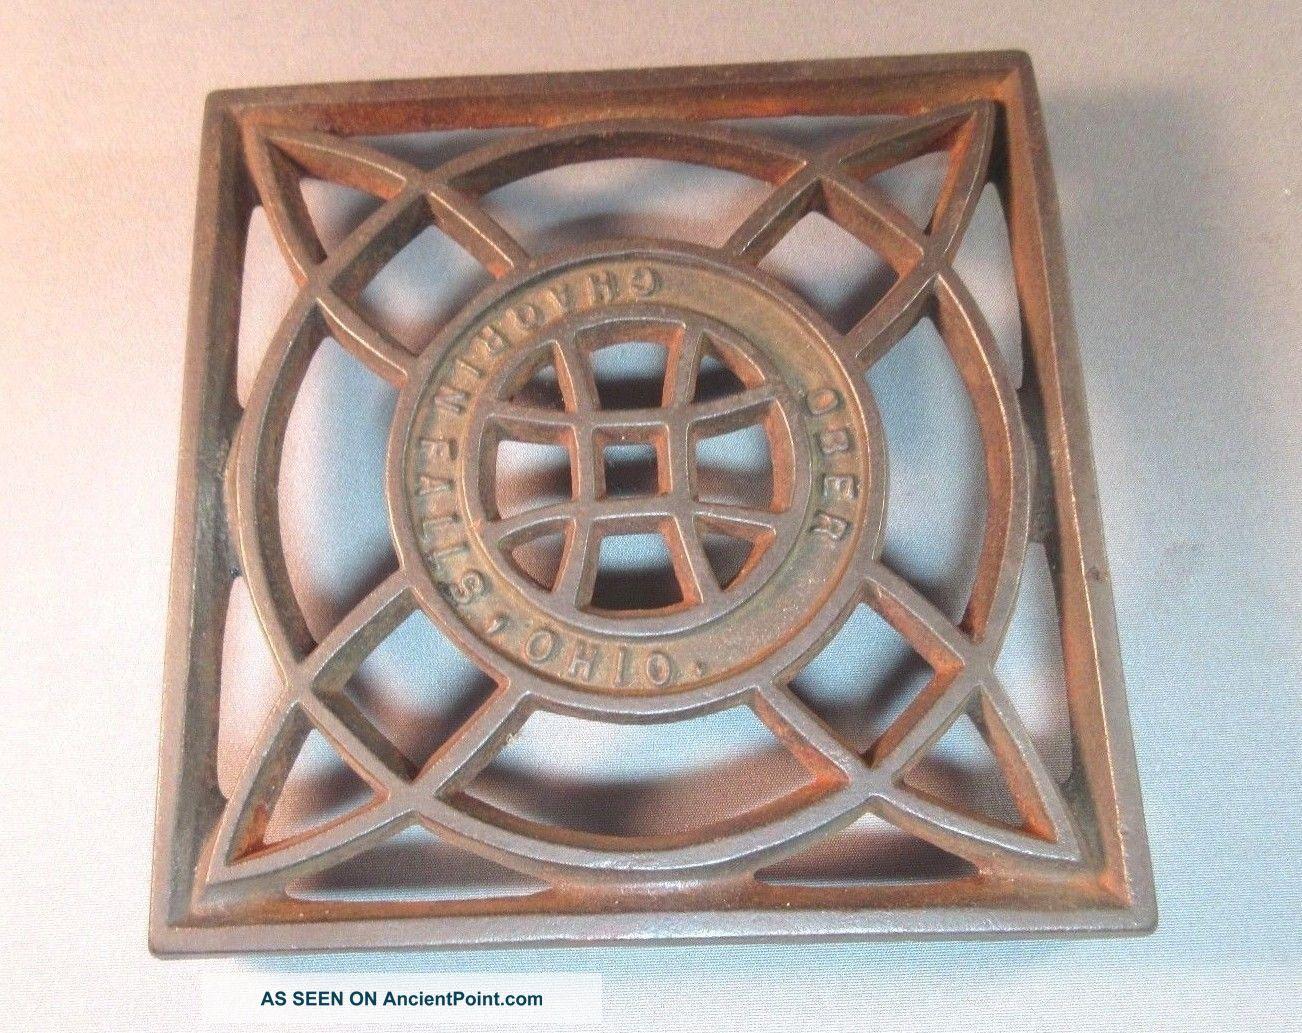 Antique Metal Decorative Square Cut - Out Trivet Ober - Chargrin Falls Ohio Trivets photo